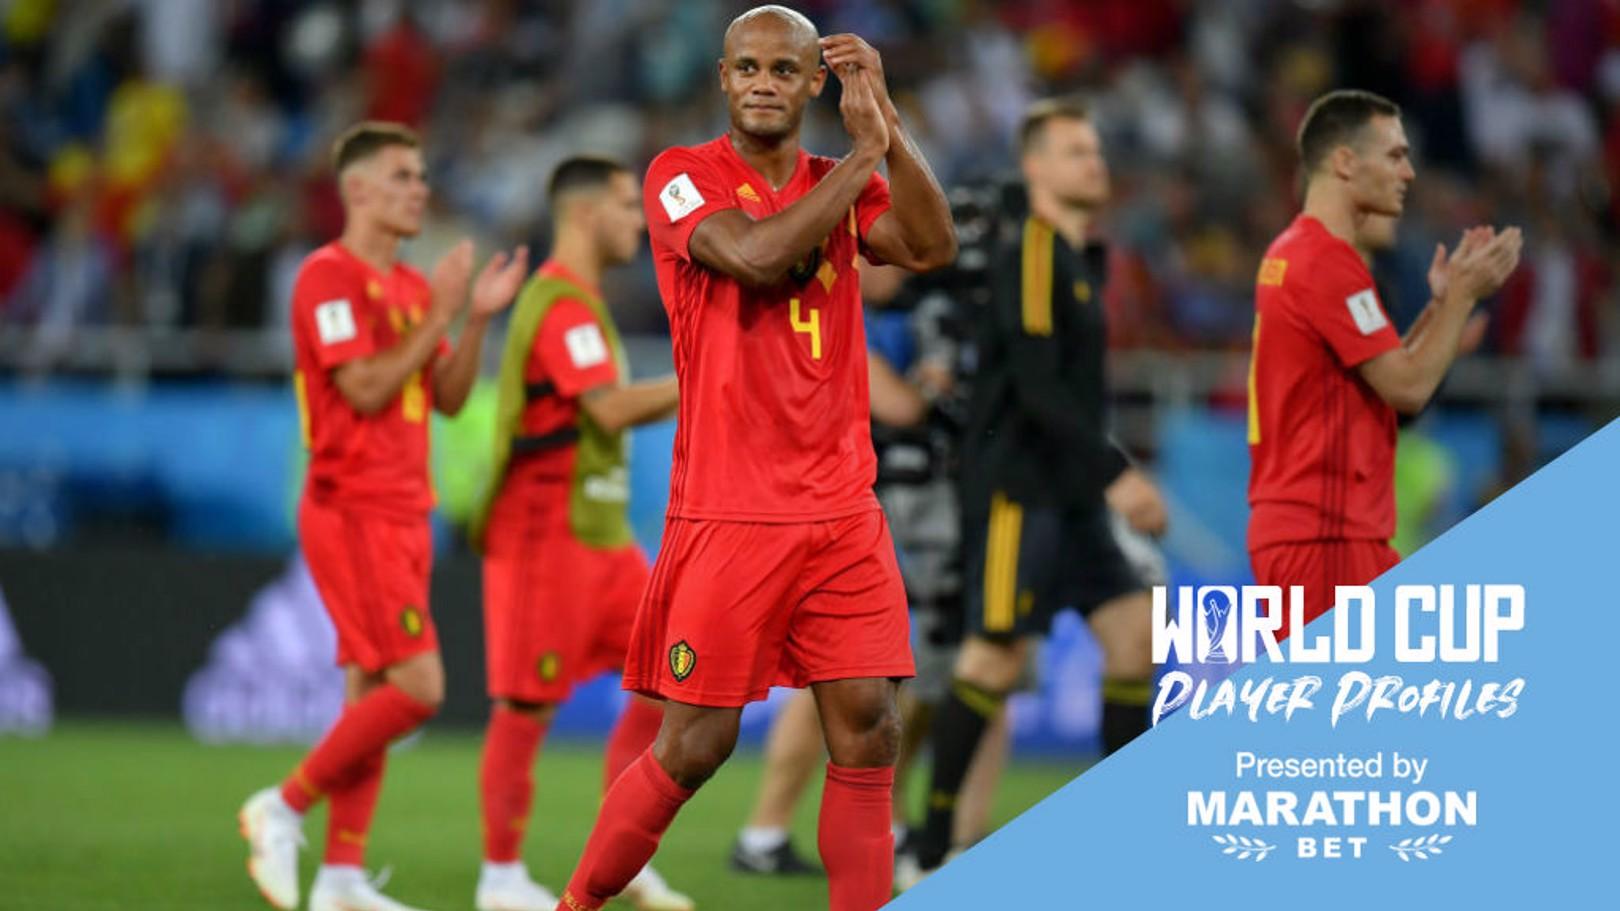 RUSSIA 2018: Vincent Kompany is still a key member of the Belgium squad